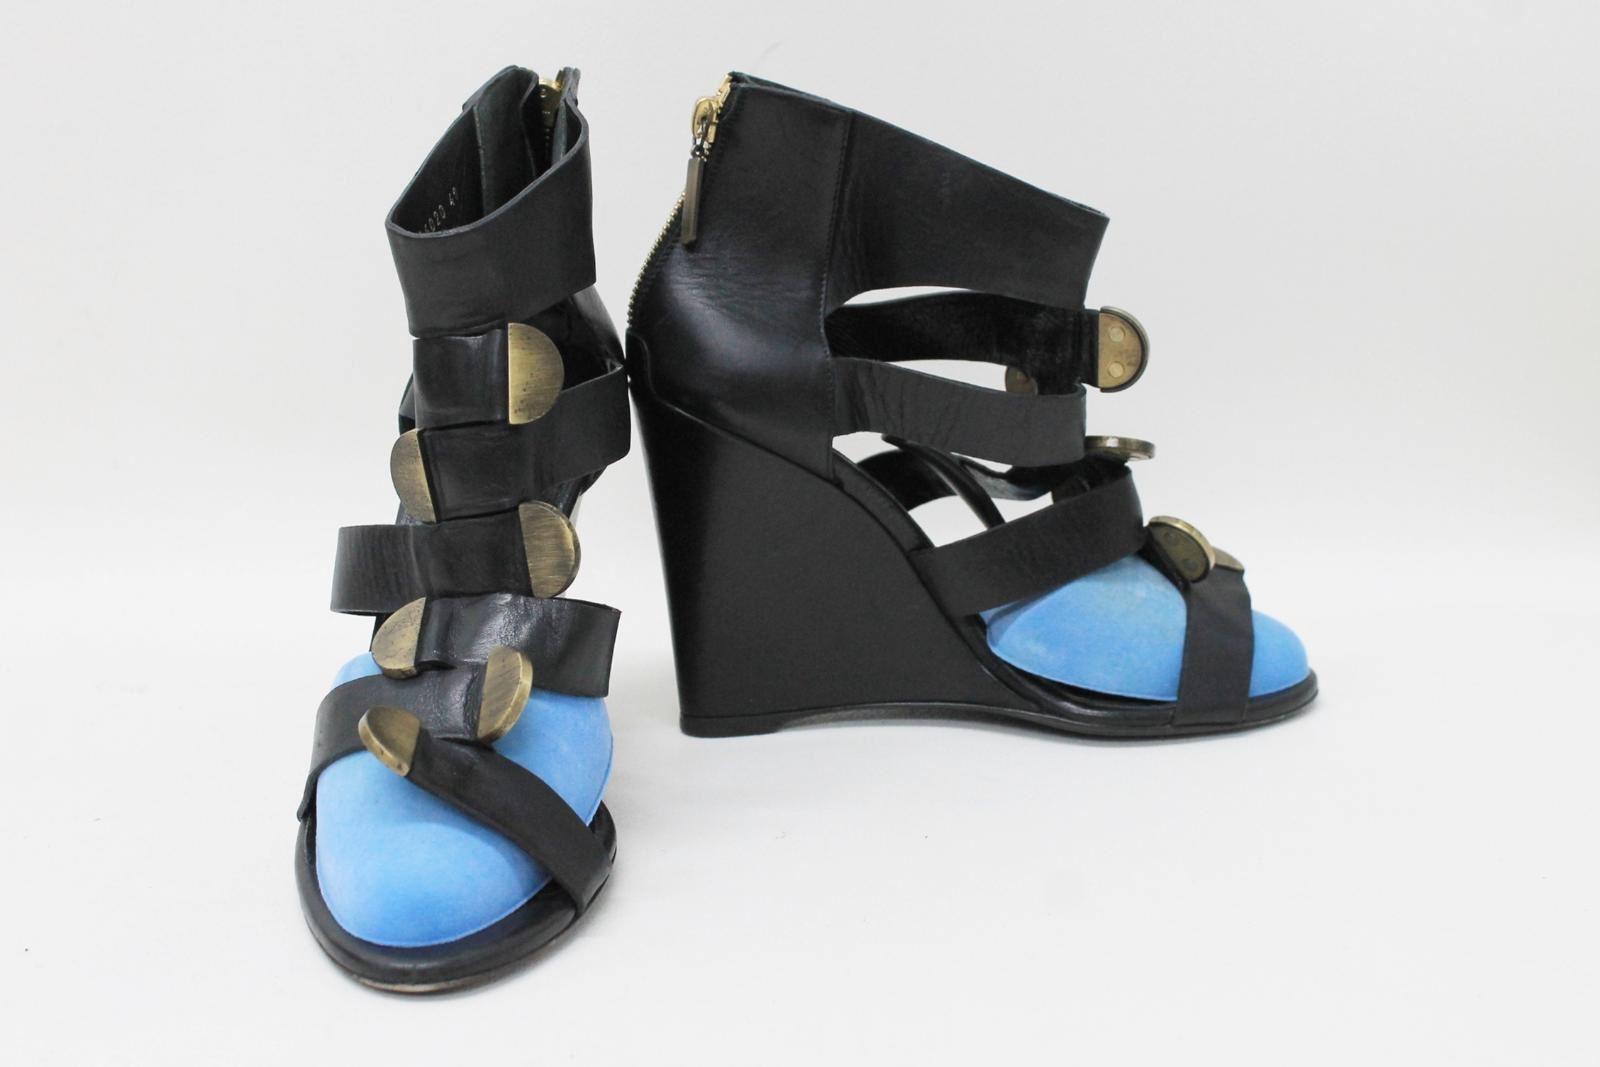 BALENCIAGA-PARIS-Ladies-Black-Leather-Strappy-Wedge-Sandals-Shoes-EU40-UK7